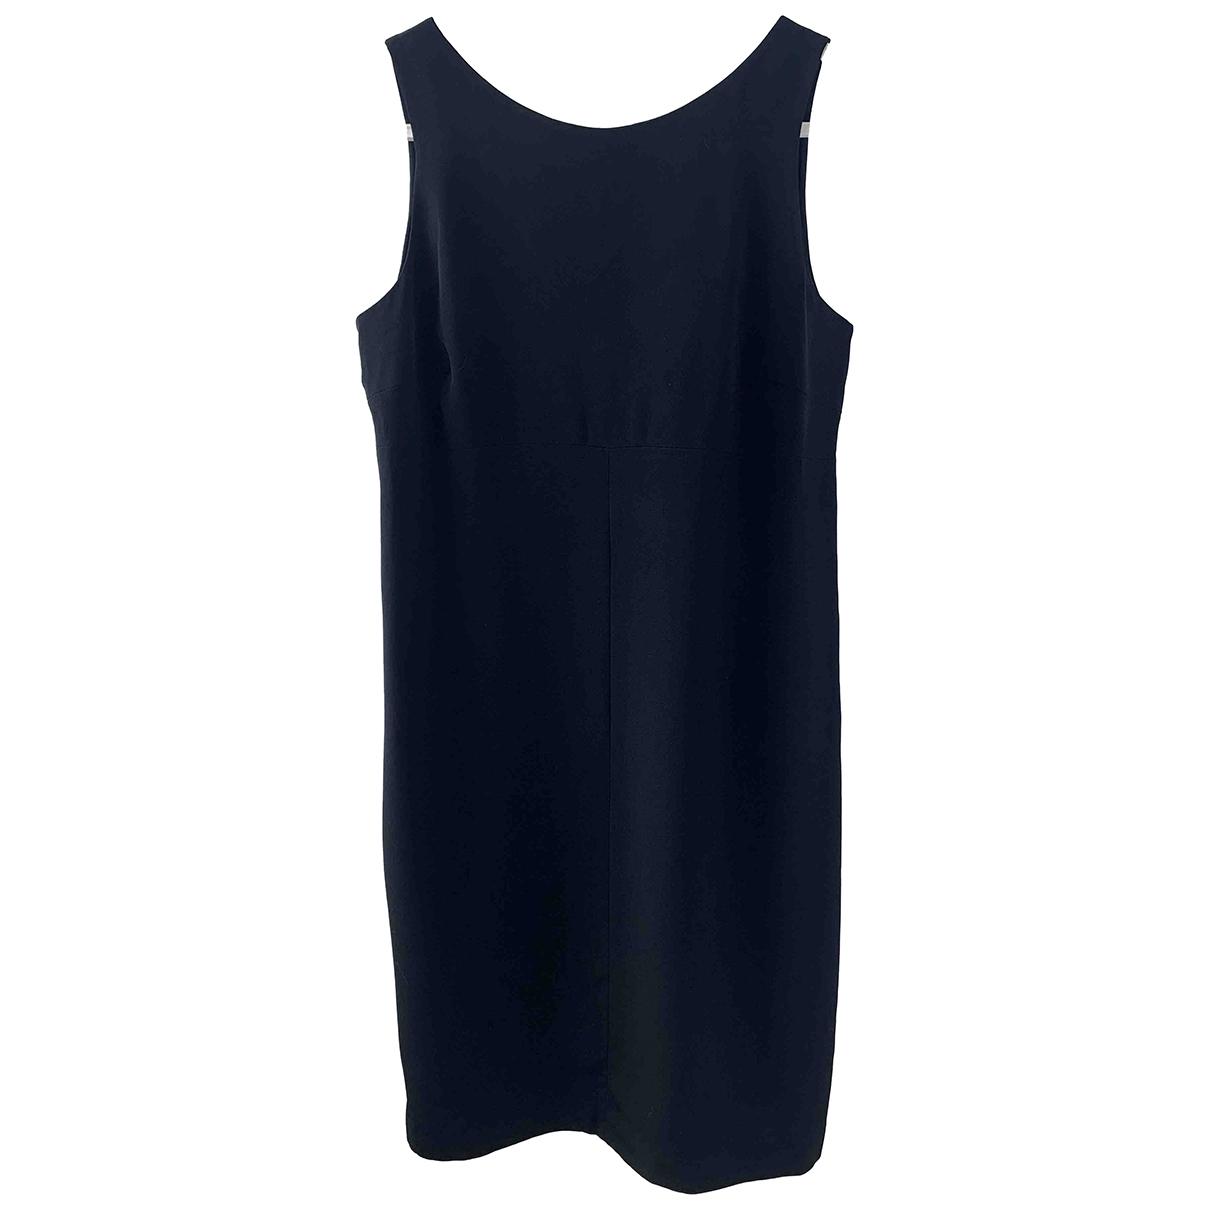 Prada \N Black dress for Women M International